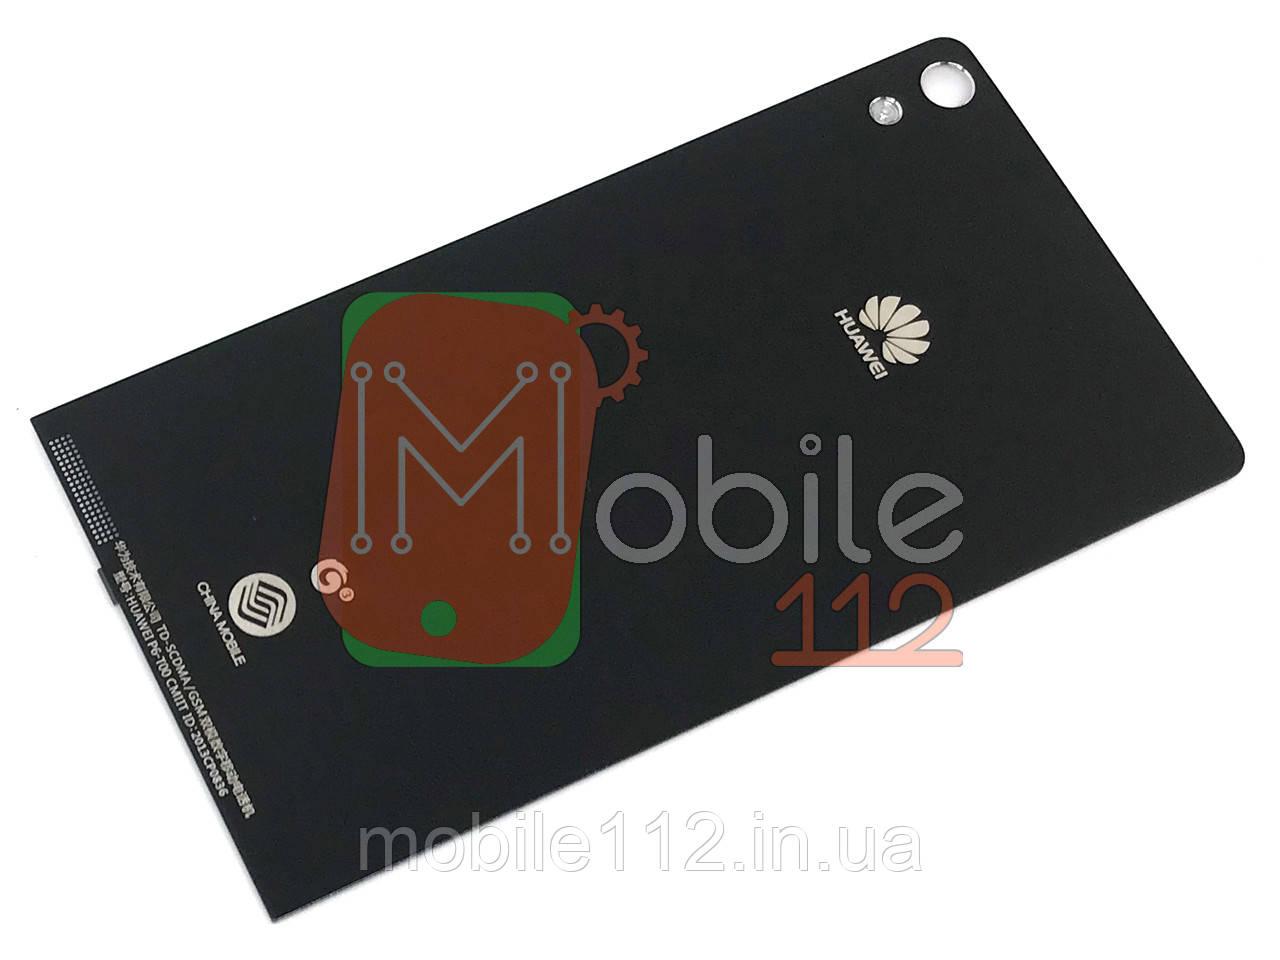 Задняя крышка Huawei P6-U06 Ascend черная